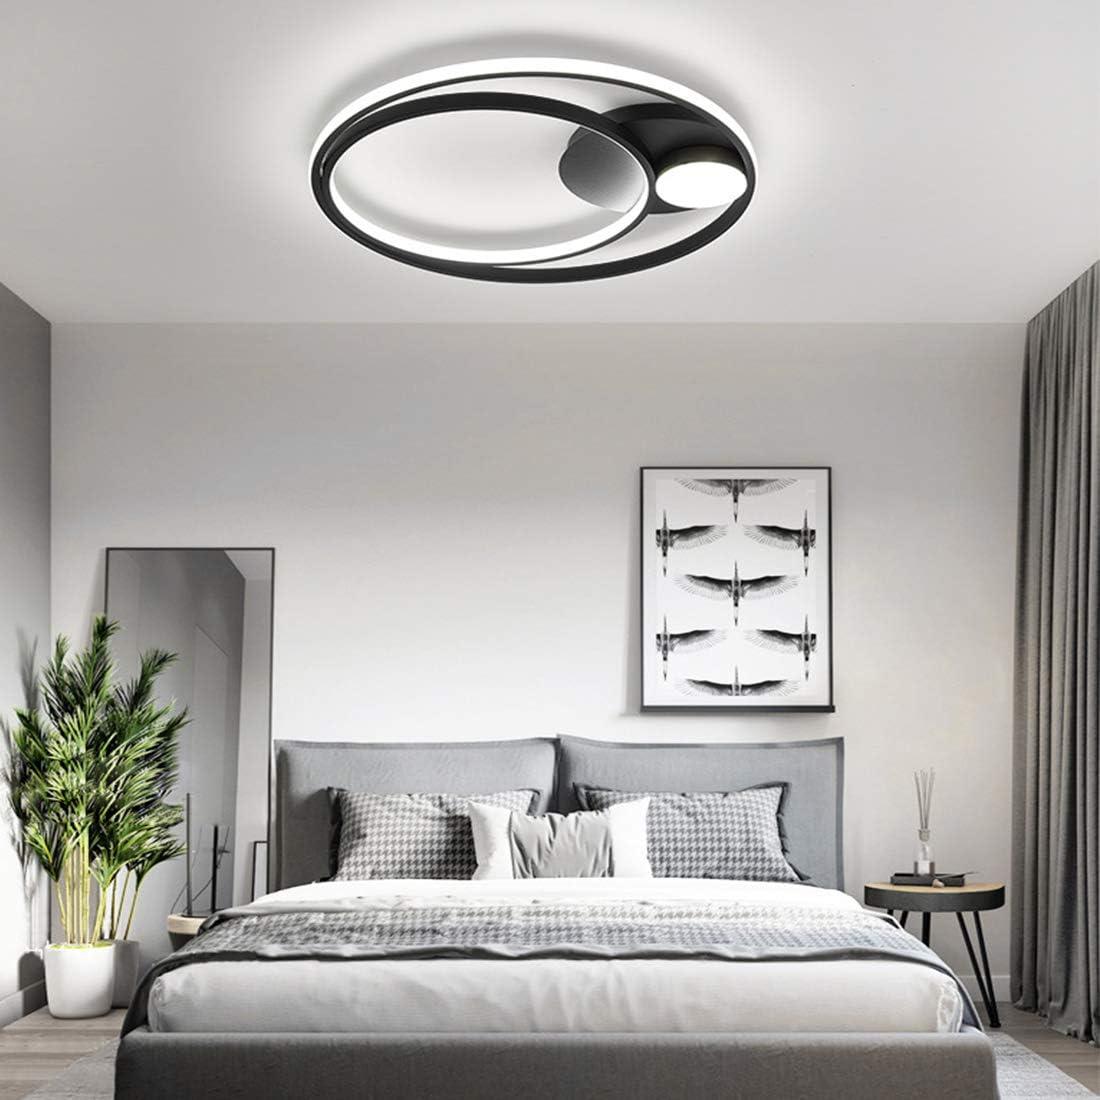 LED Bedroom Ceiling Lamp Modern Dimmable Ring Designer Ceiling